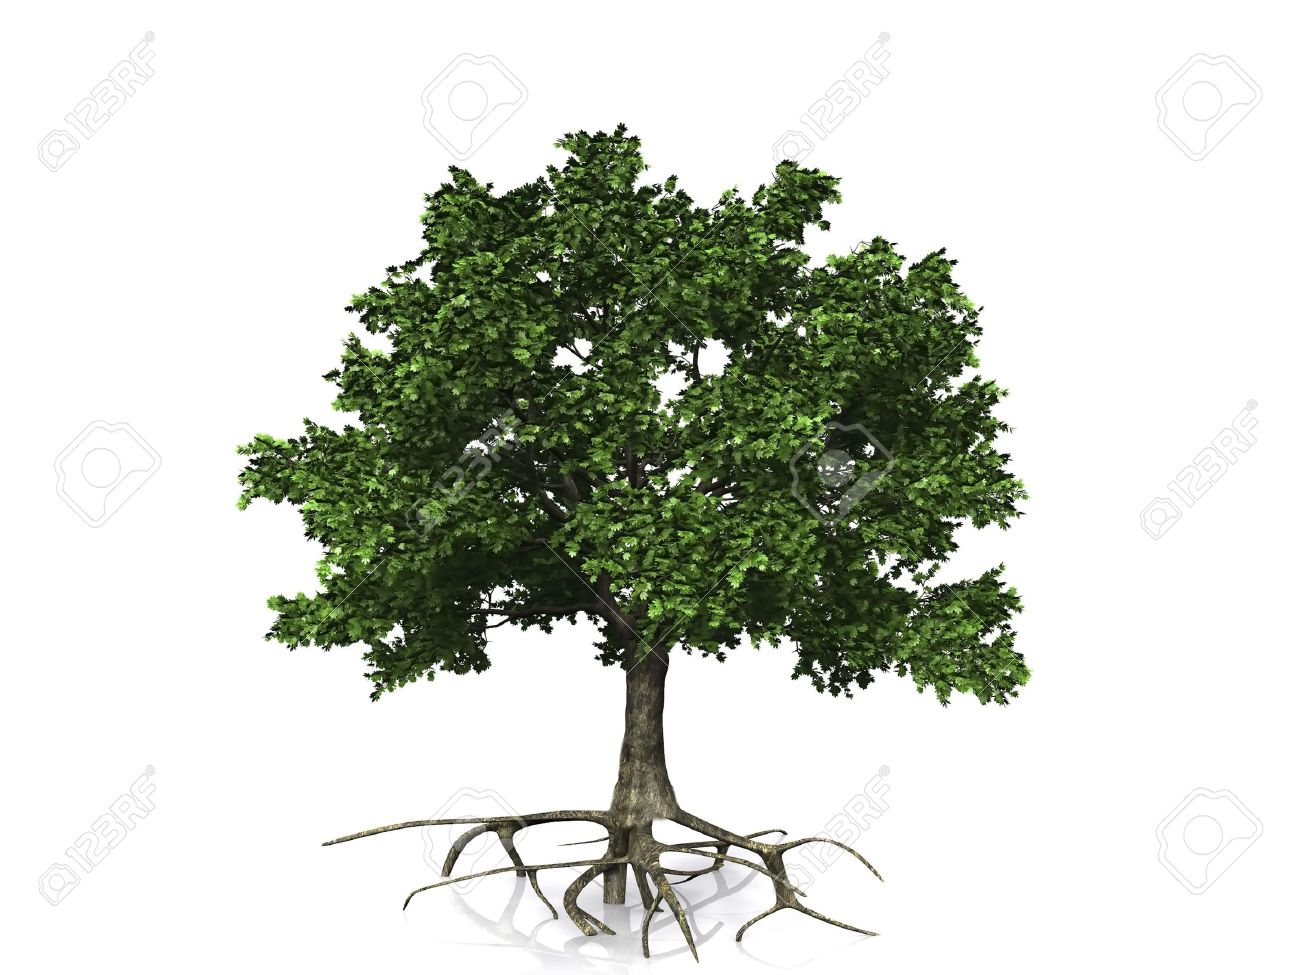 oak  on a white background Stock Photo - 10974657